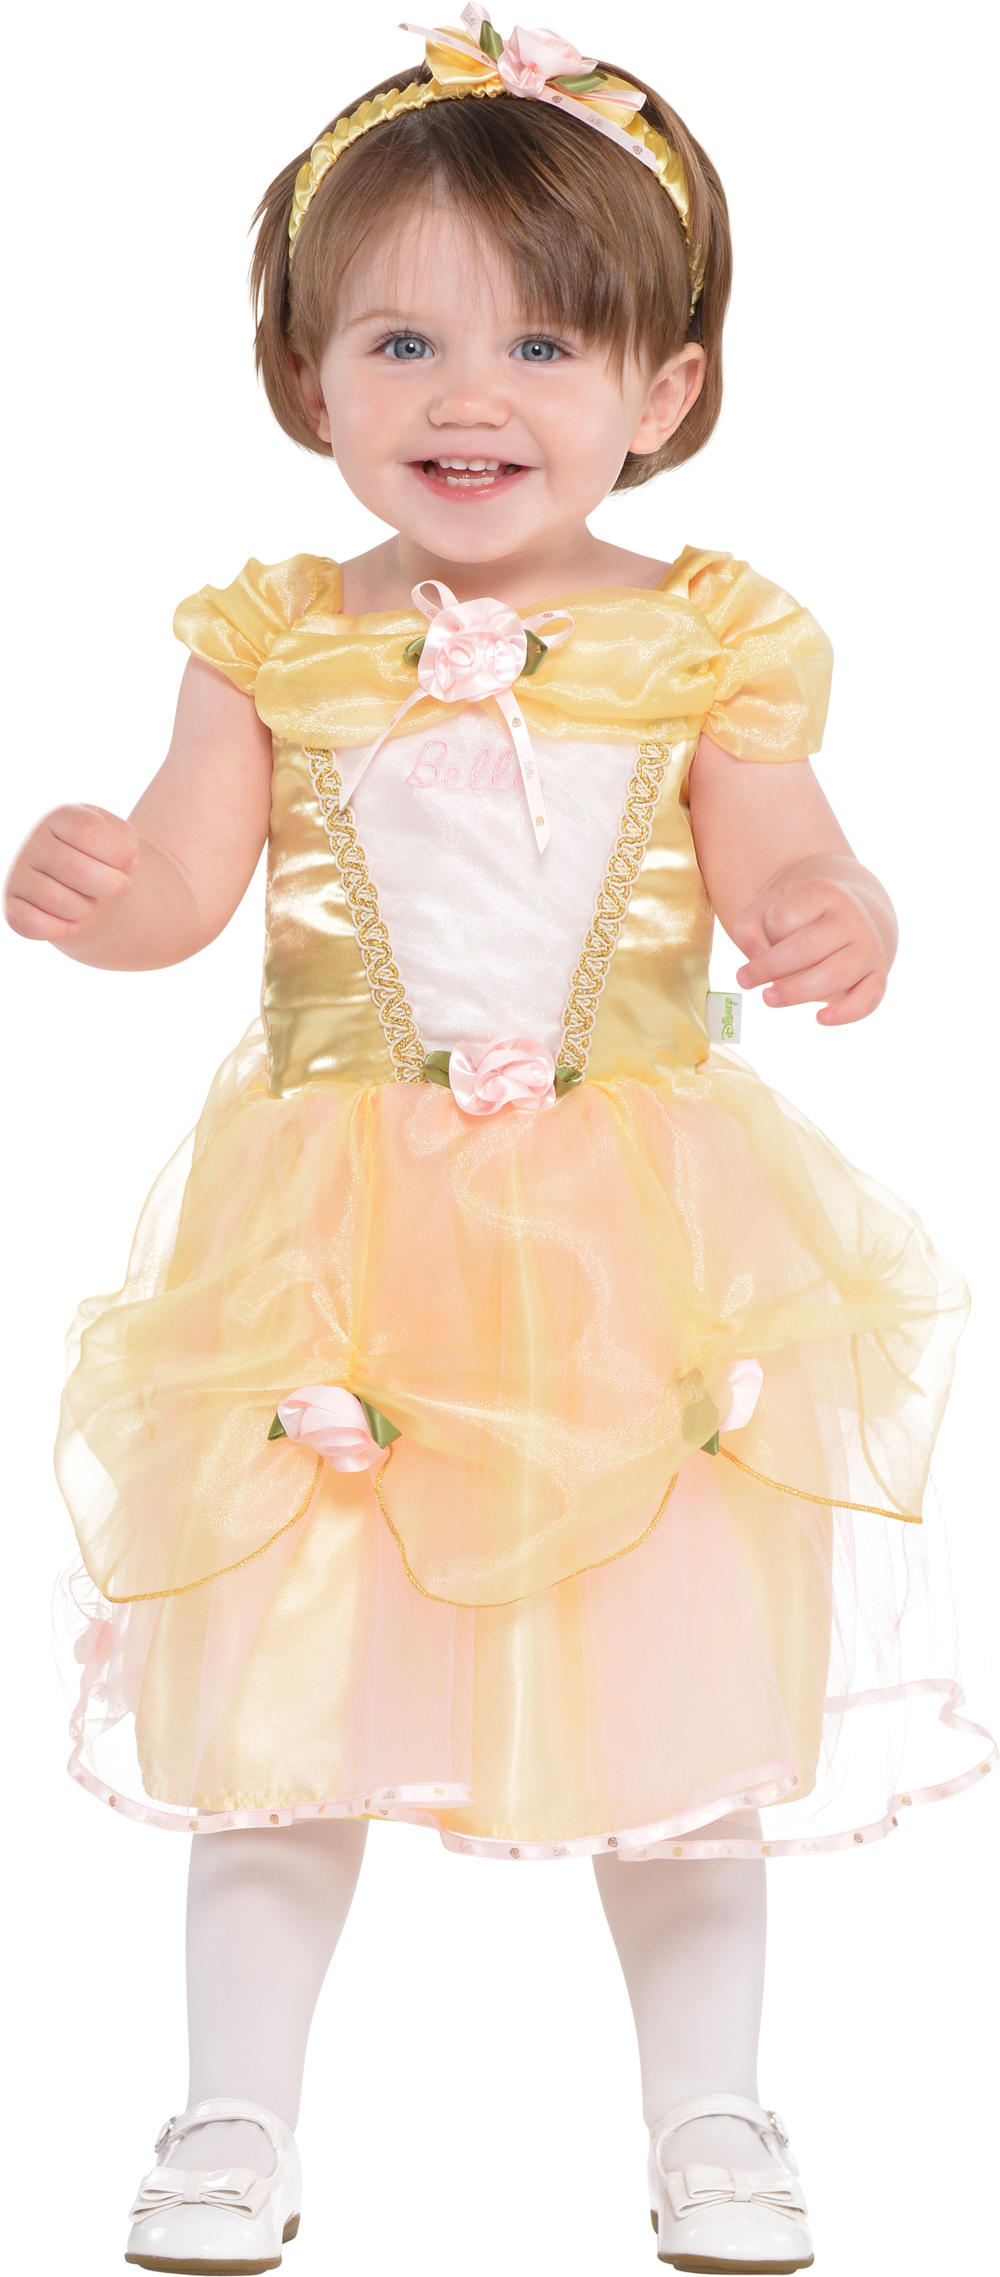 Belle 3-24 Months Fancy Dress Disney Princess Beauty Babies Girls Infant Costume